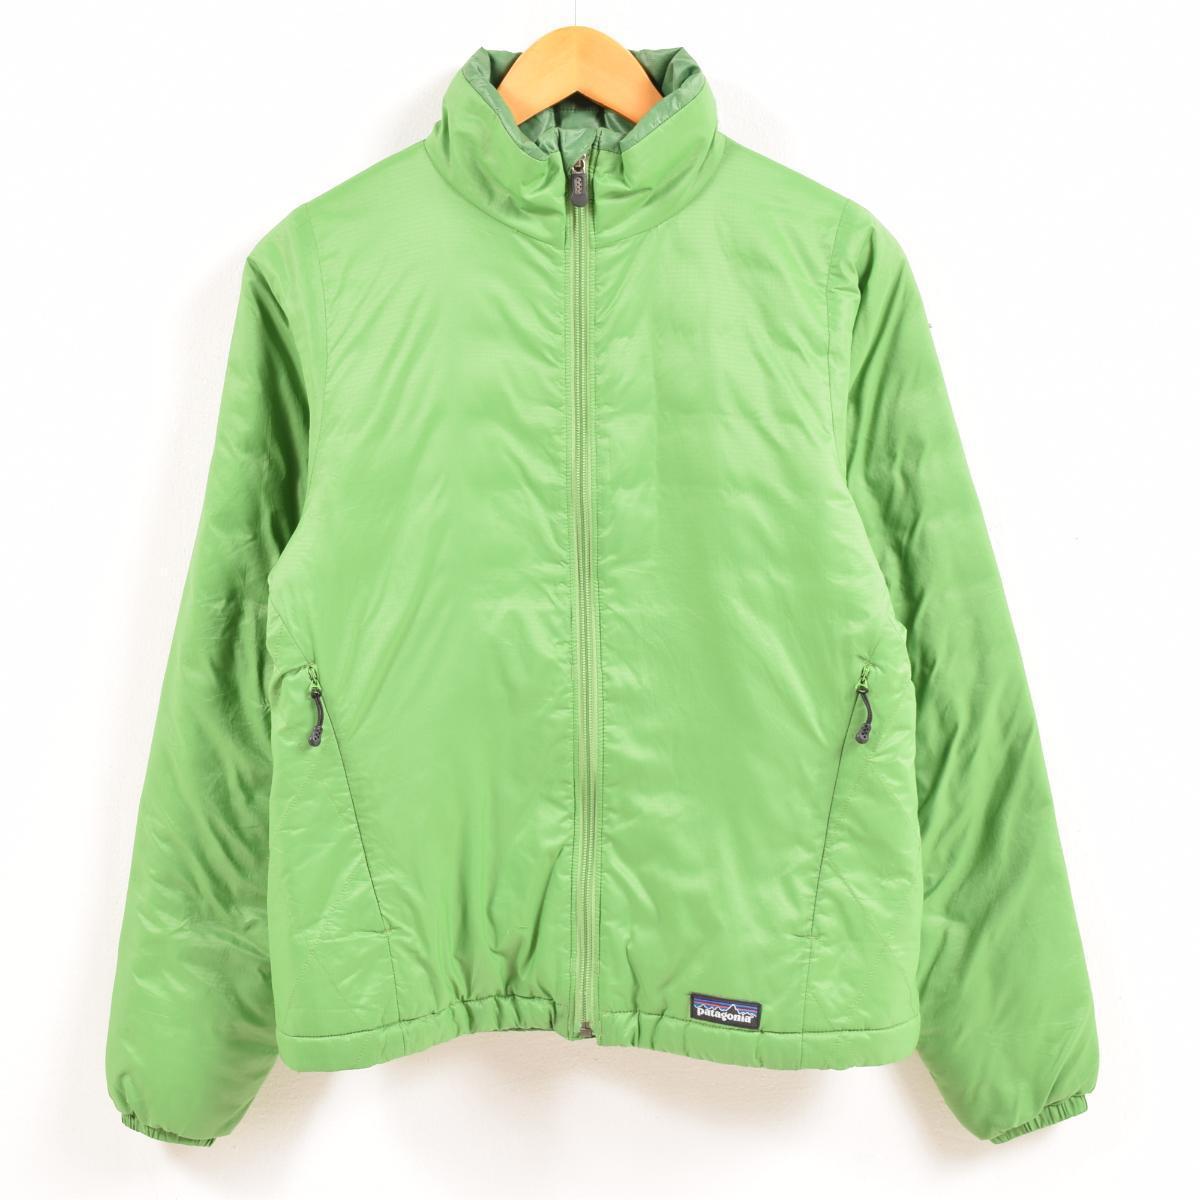 f11ec12a9db6c パタゴニアのおすすめキッズジャケット10選!子供向けの着こなし方も ...